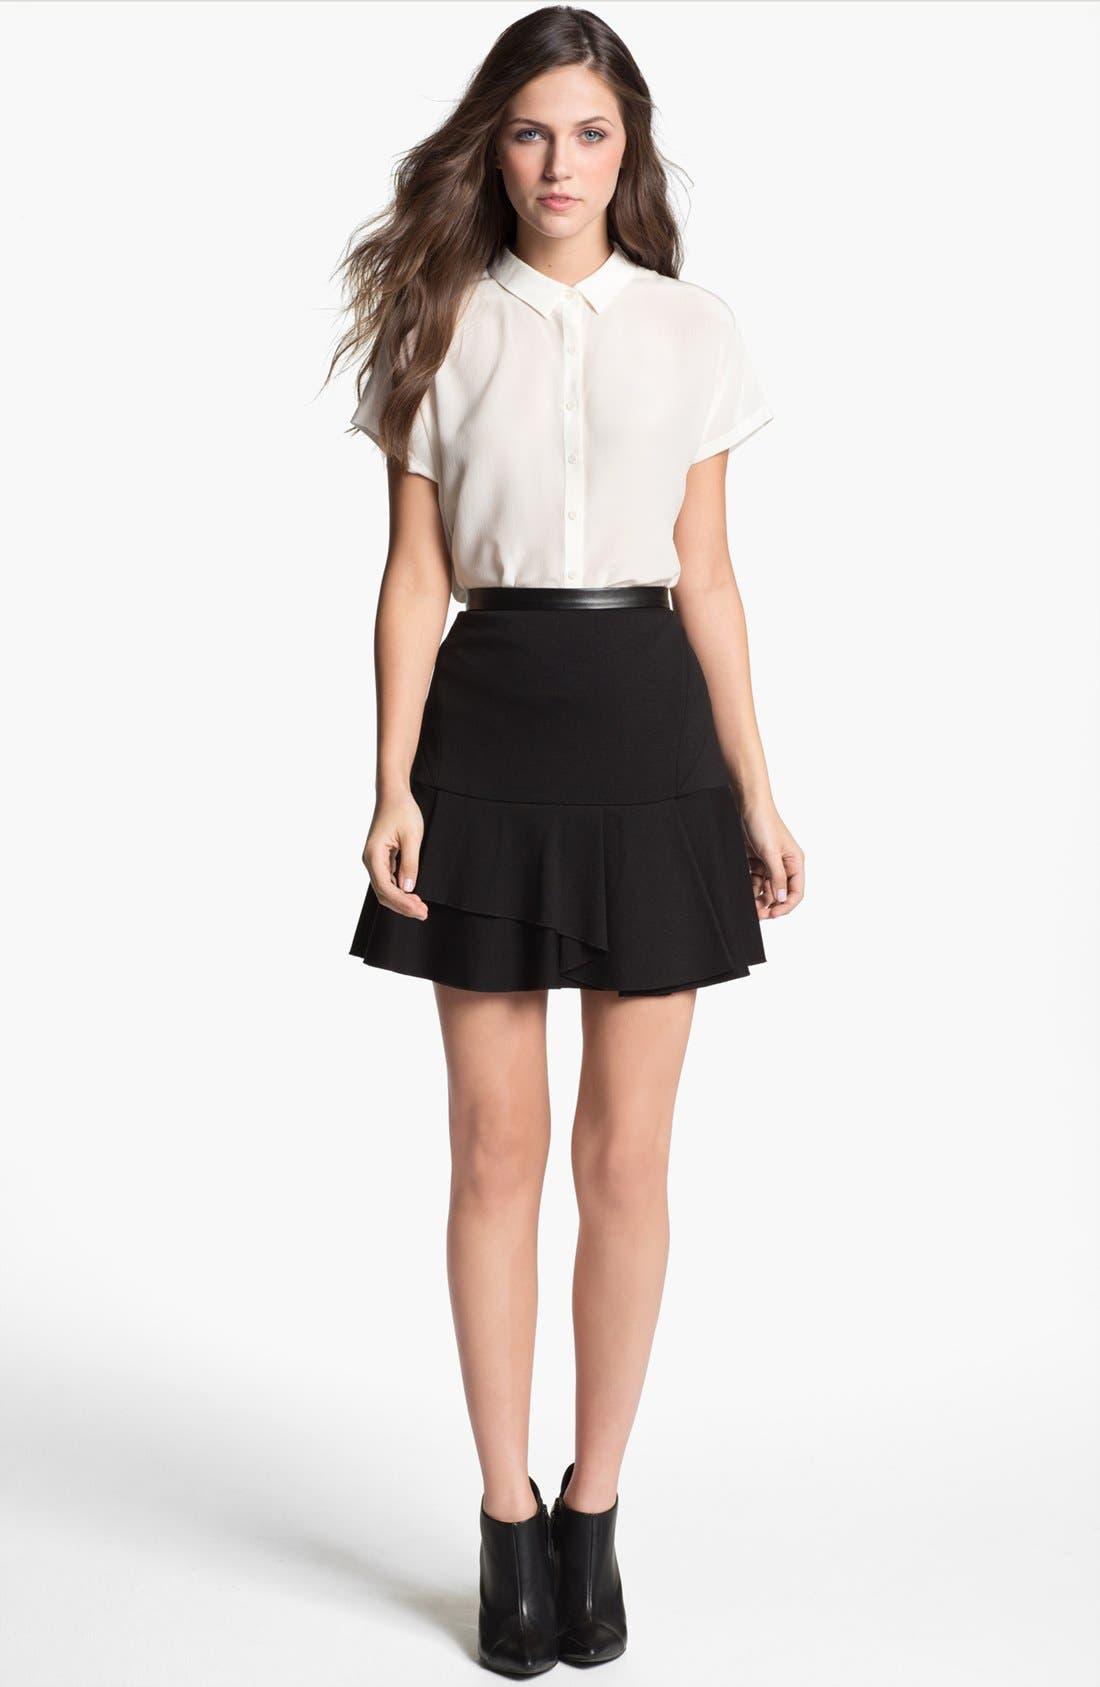 Main Image - Trouvé Blouse & Robbi & Nikki Ruffle Skirt